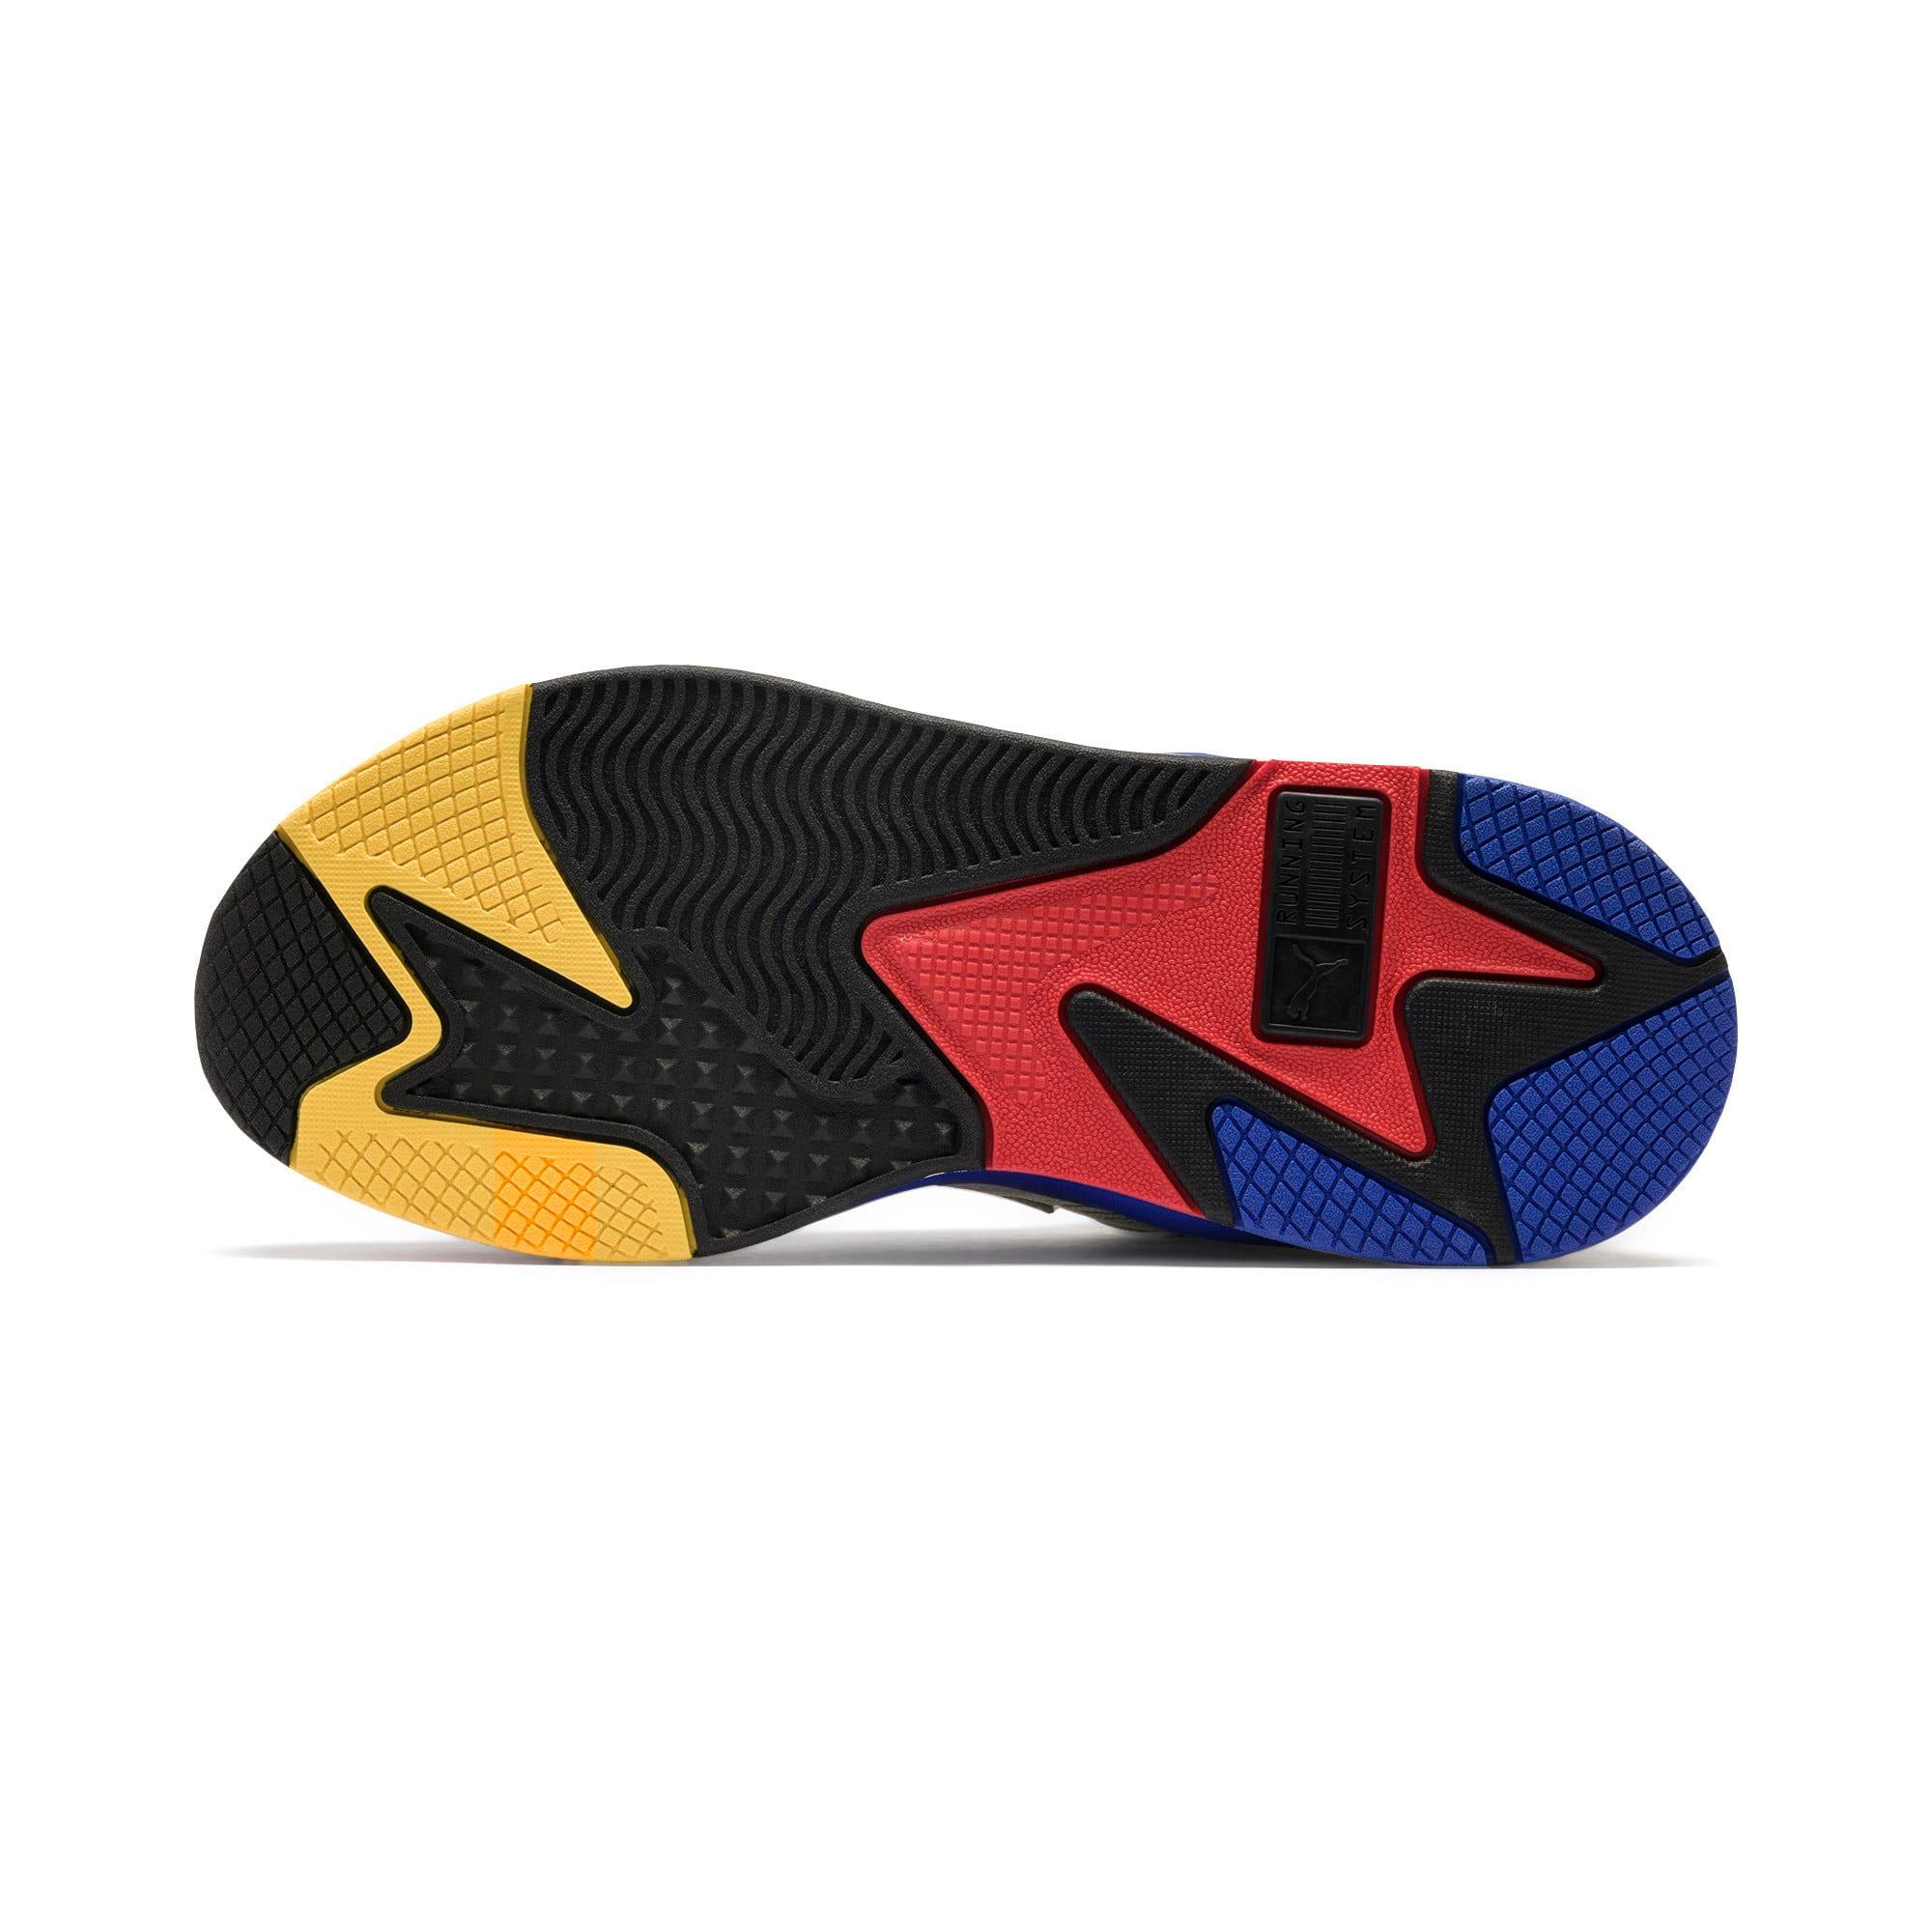 Thumbnail 6 of RS-X Colour Theory Trainers, Whisper White-Puma Black, medium-IND